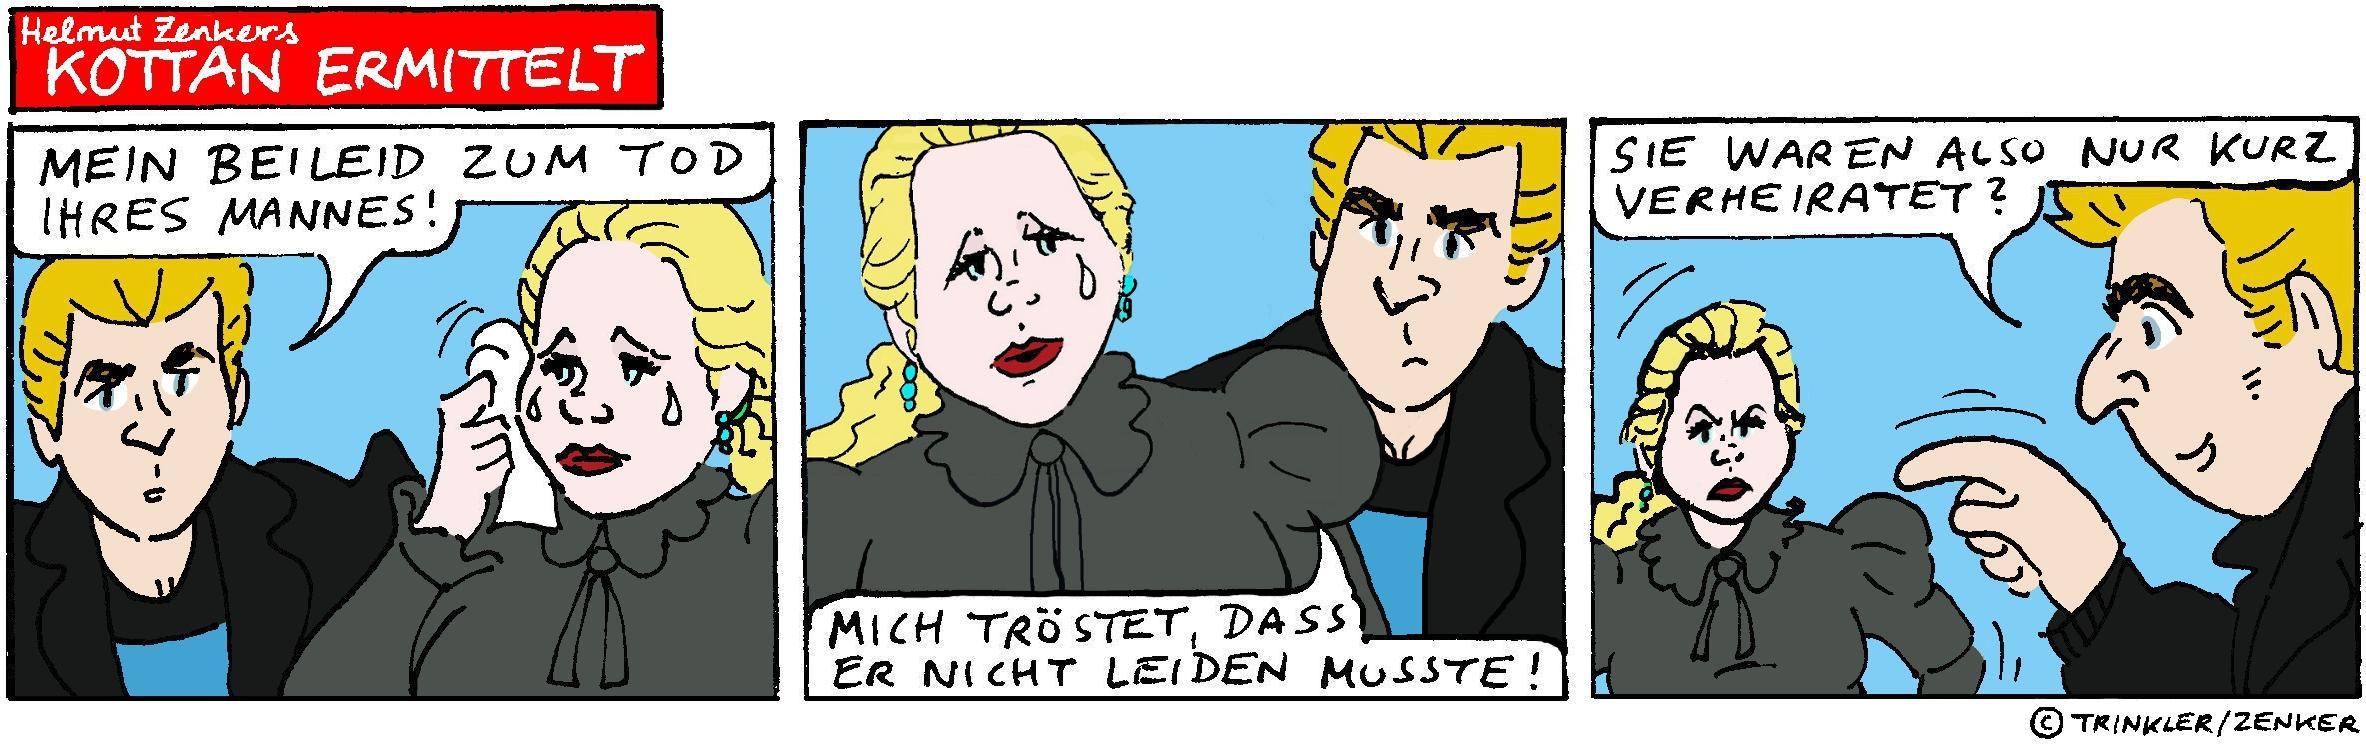 Kottan ermittelt - Comicstrip Nr. 2